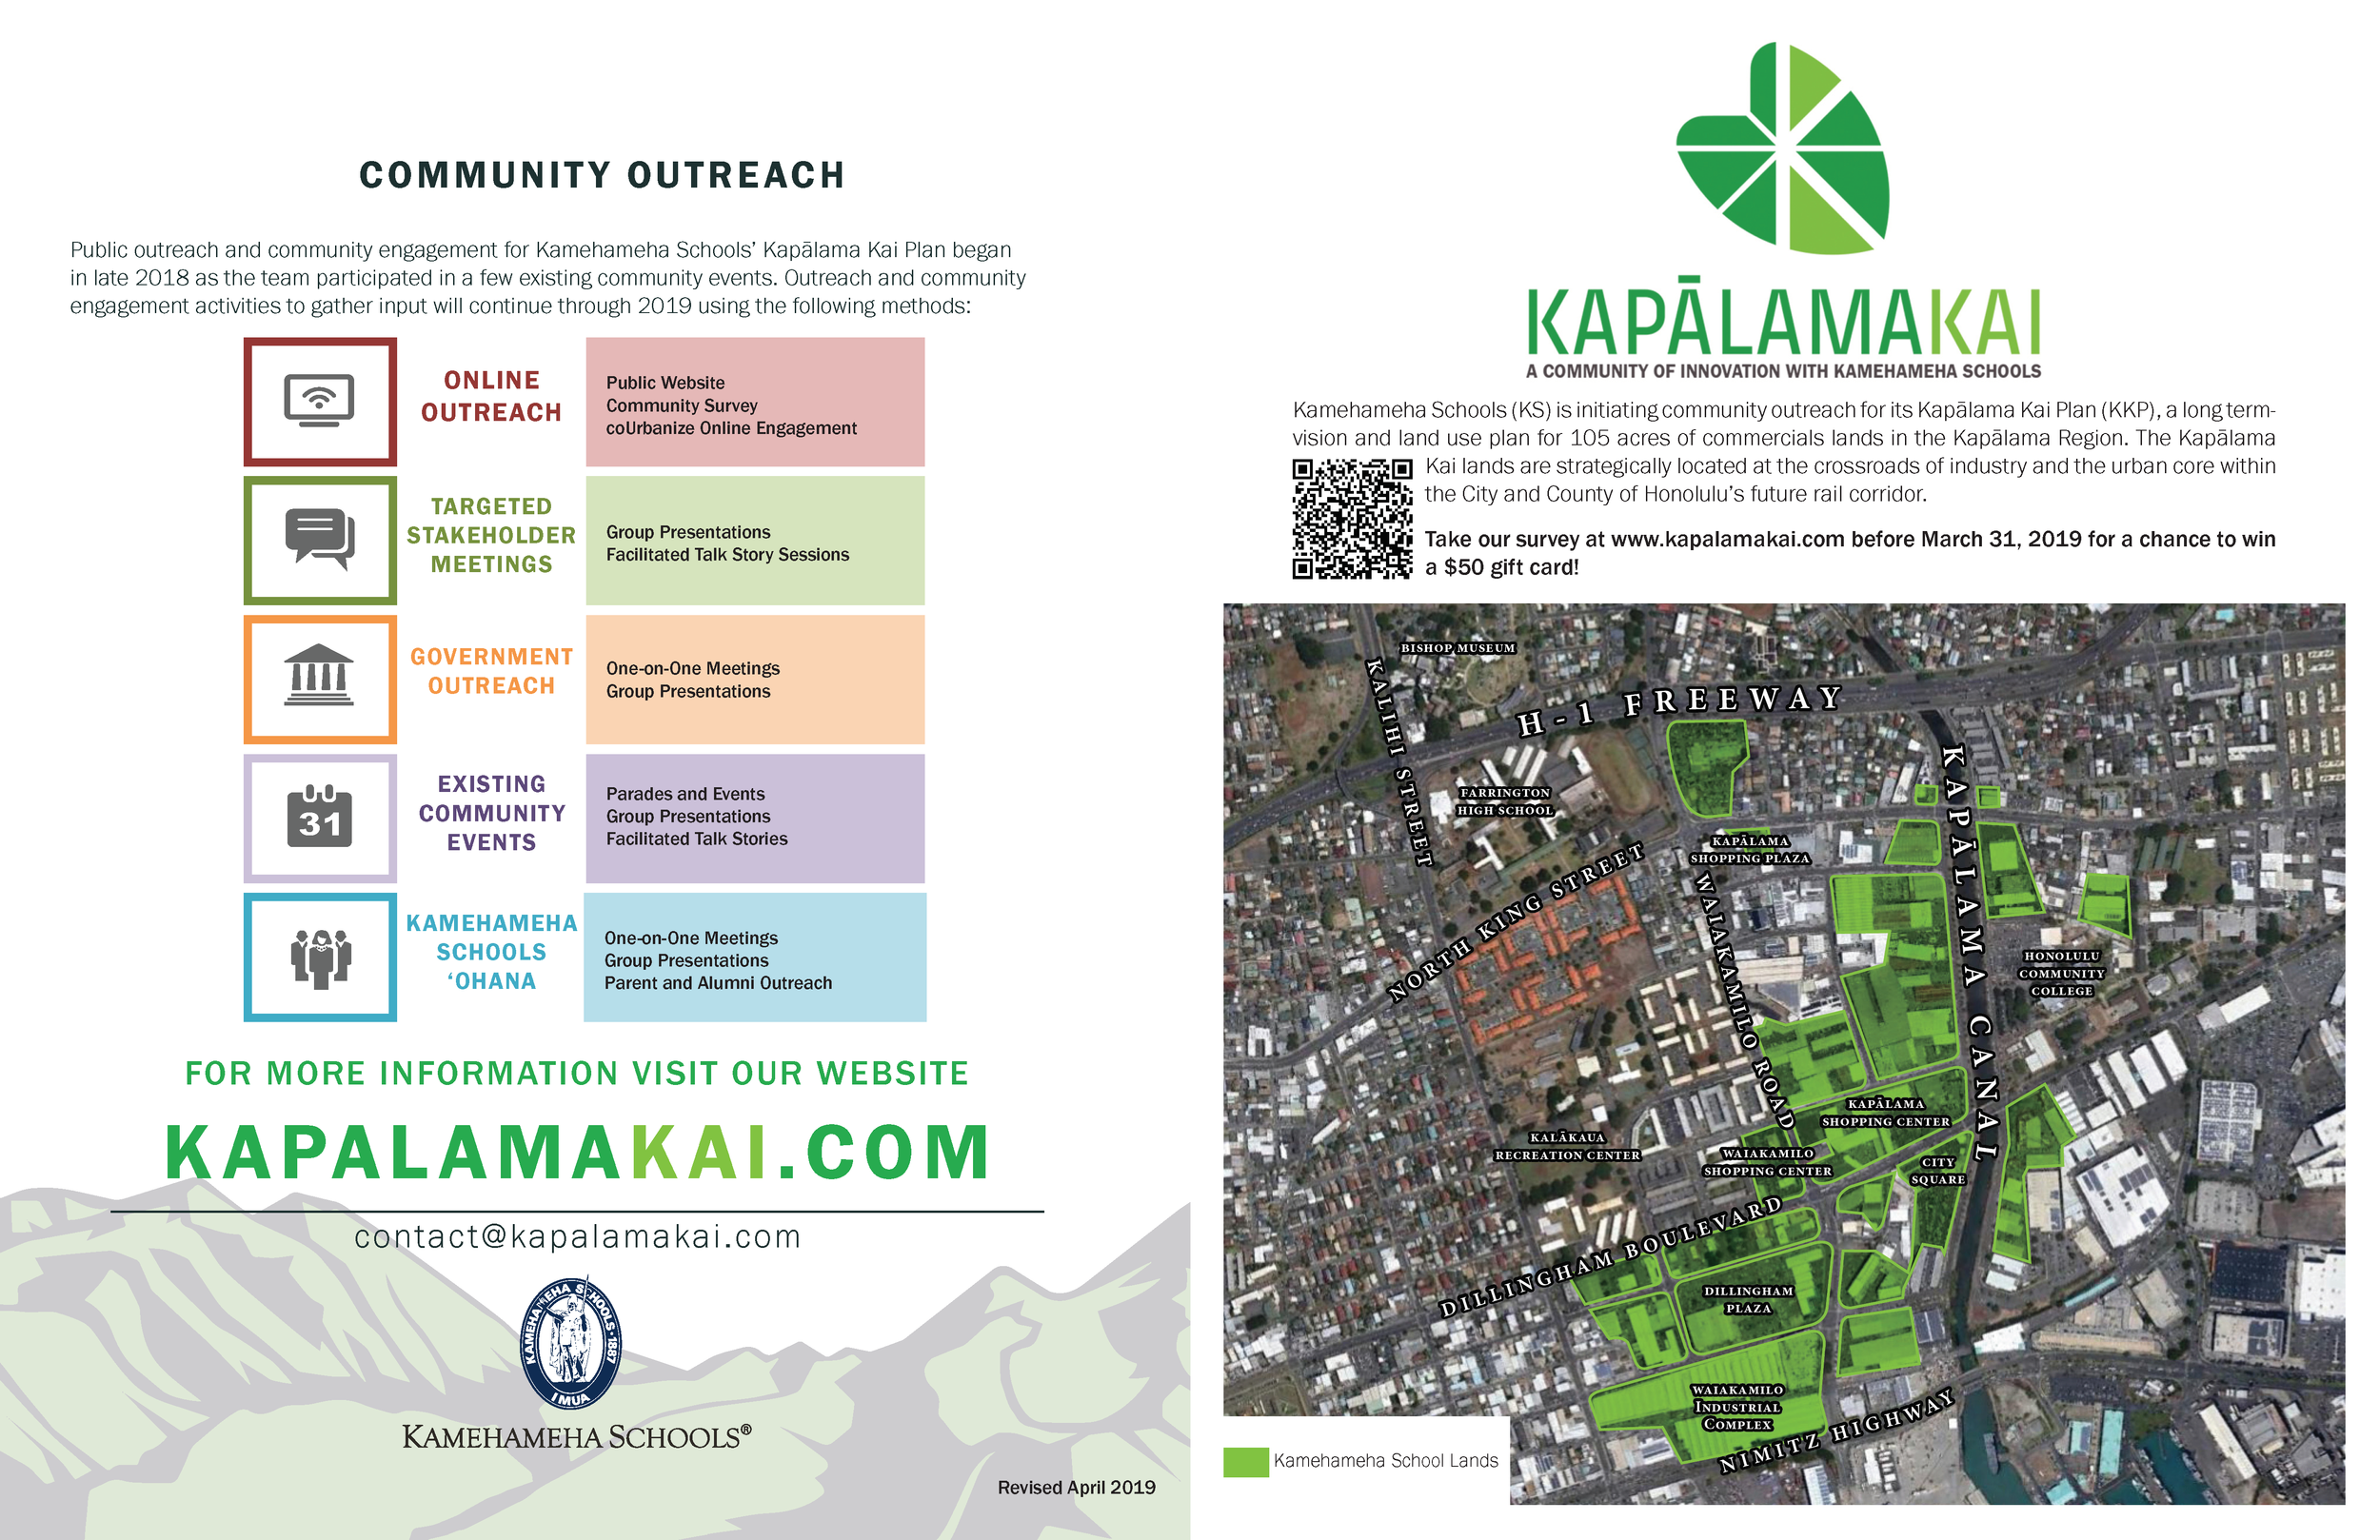 KS - Kapalama Kai Brochure Re-Brand (Draft 3)_Page_1.png